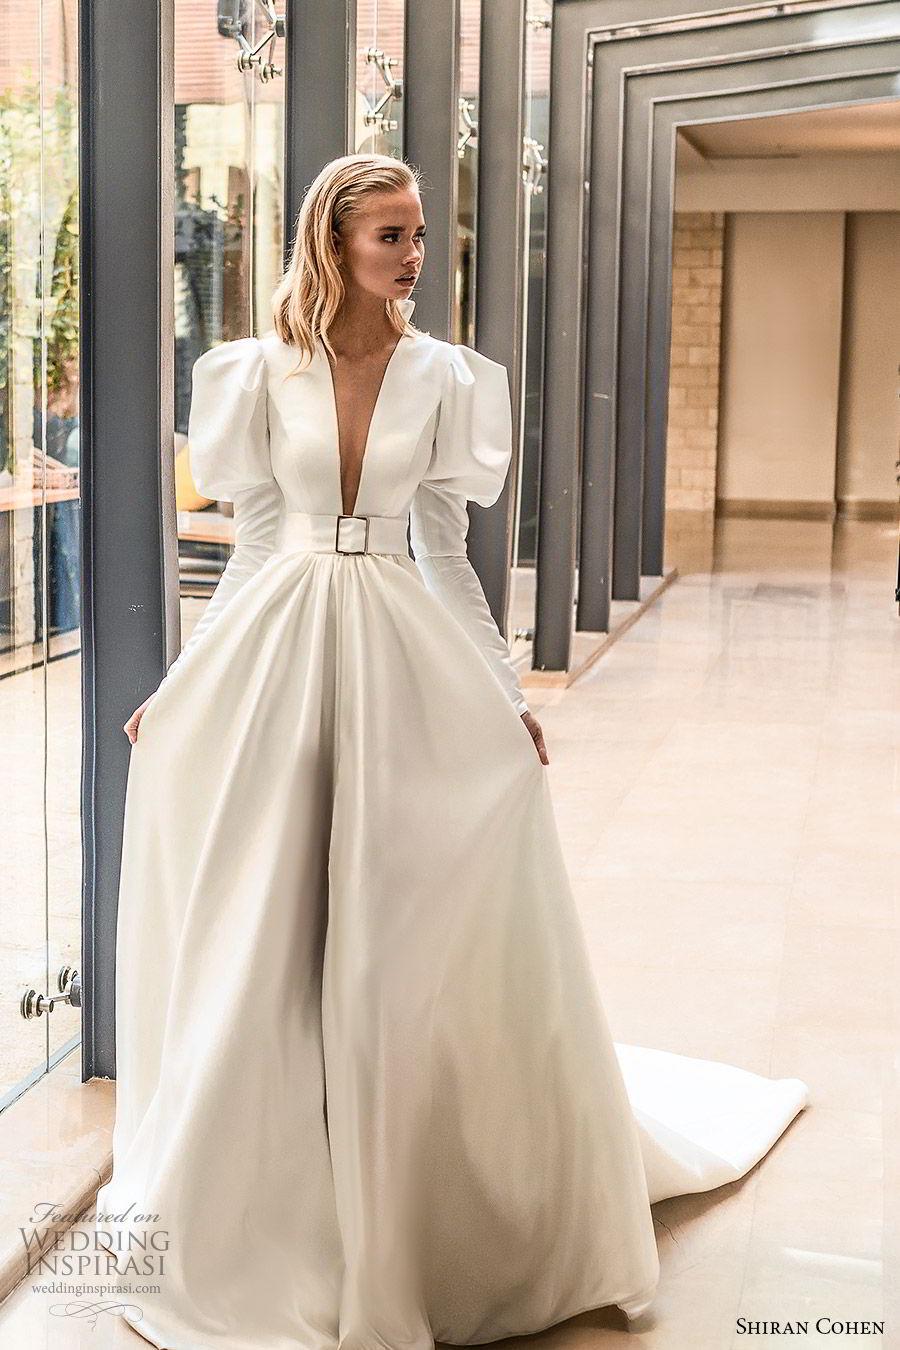 shiran cohen 2019 bridal mutton sleeves plunging v neckline collar belt a line ball gown wedding dress chapel train romantic princess clean modern (5) mv